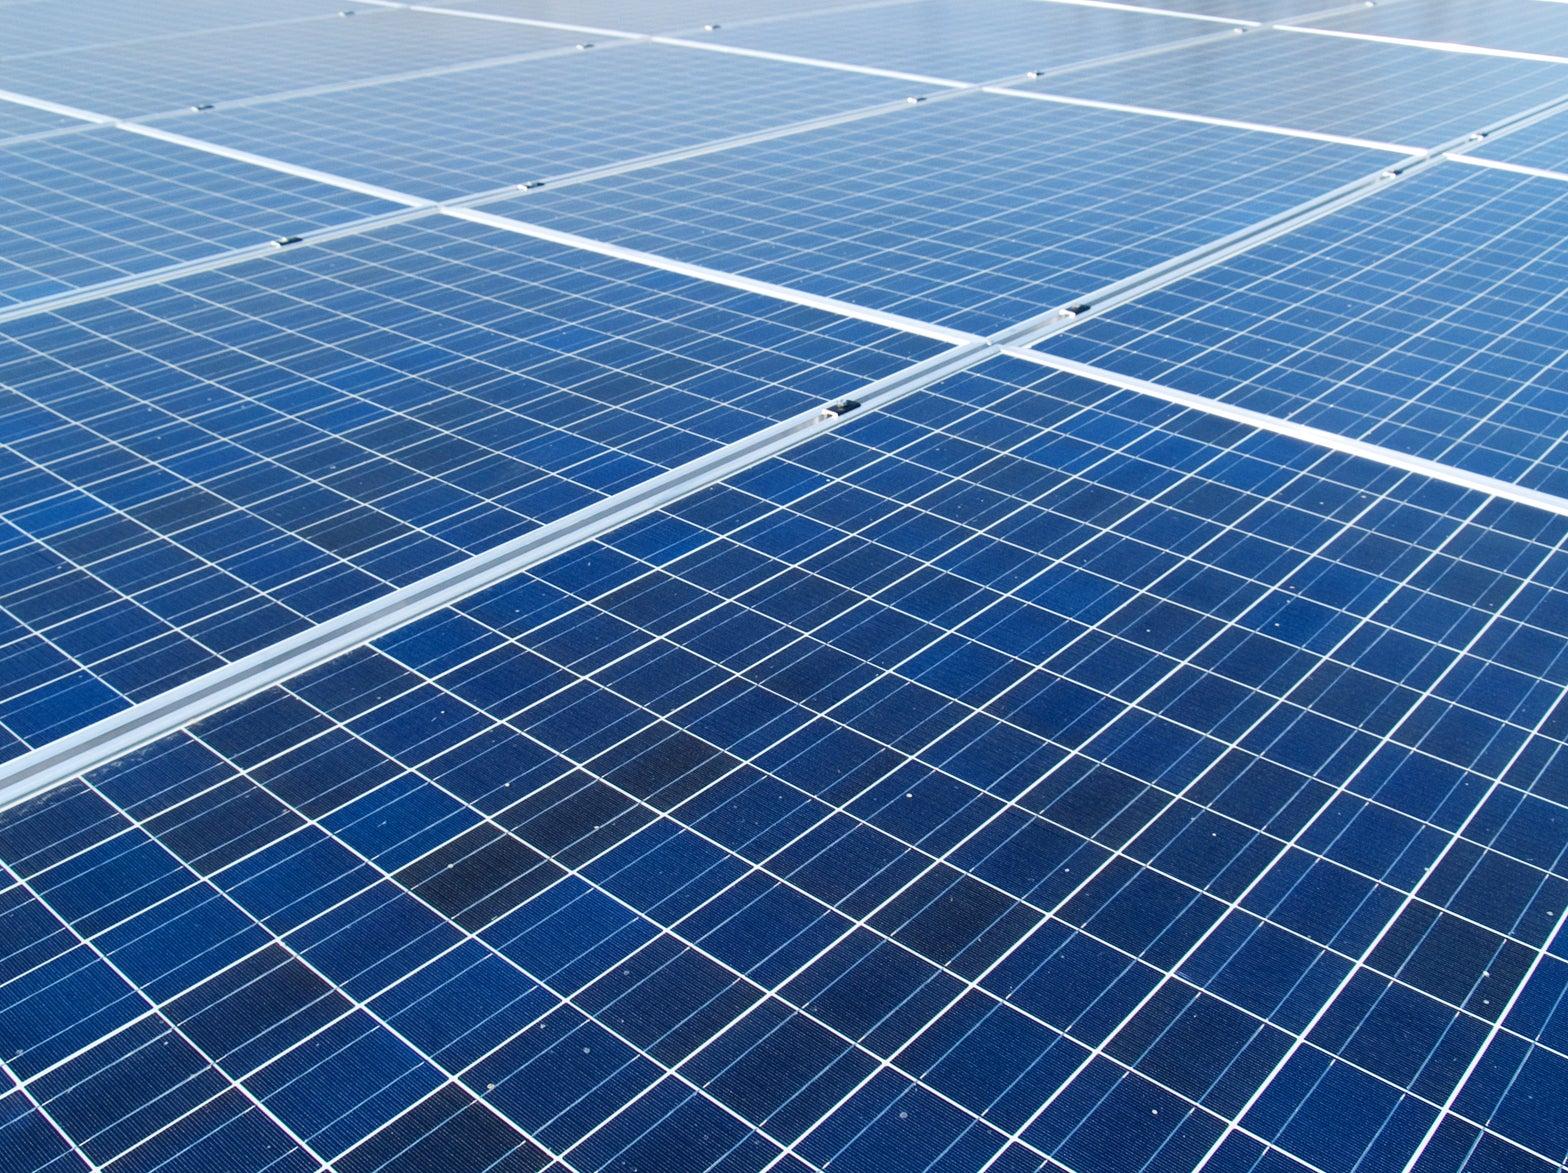 Brazil Is Building A Giant Floating Solar Farm